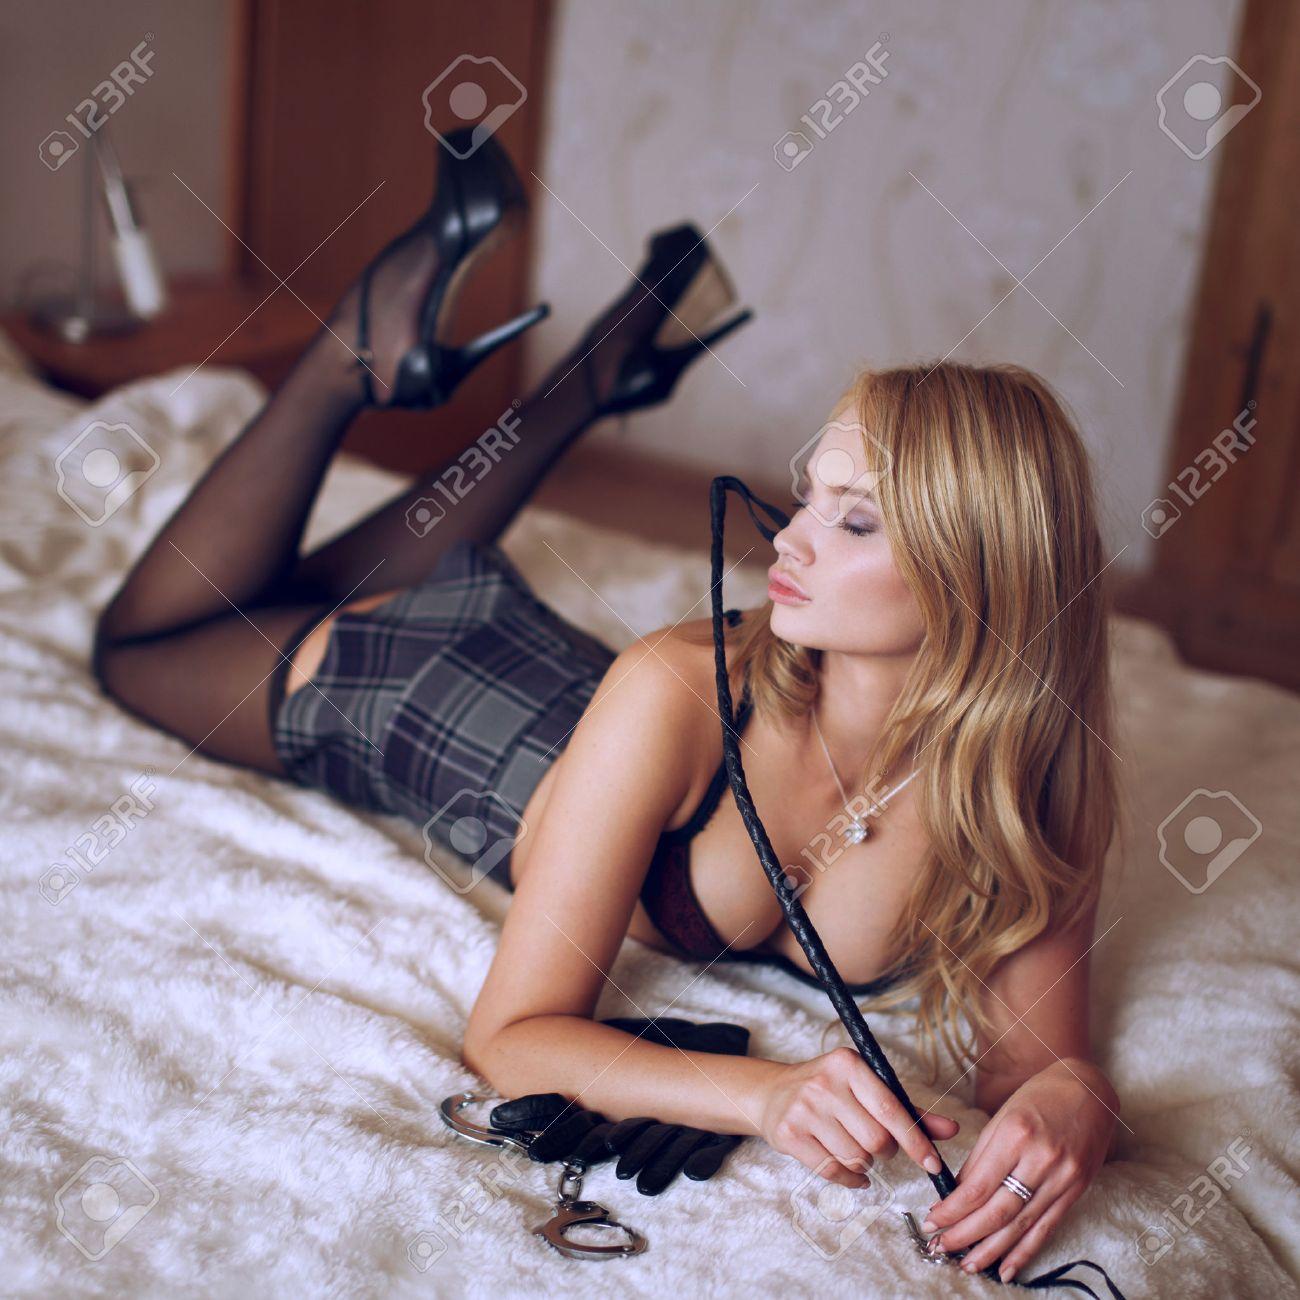 Deep penetration threesome video